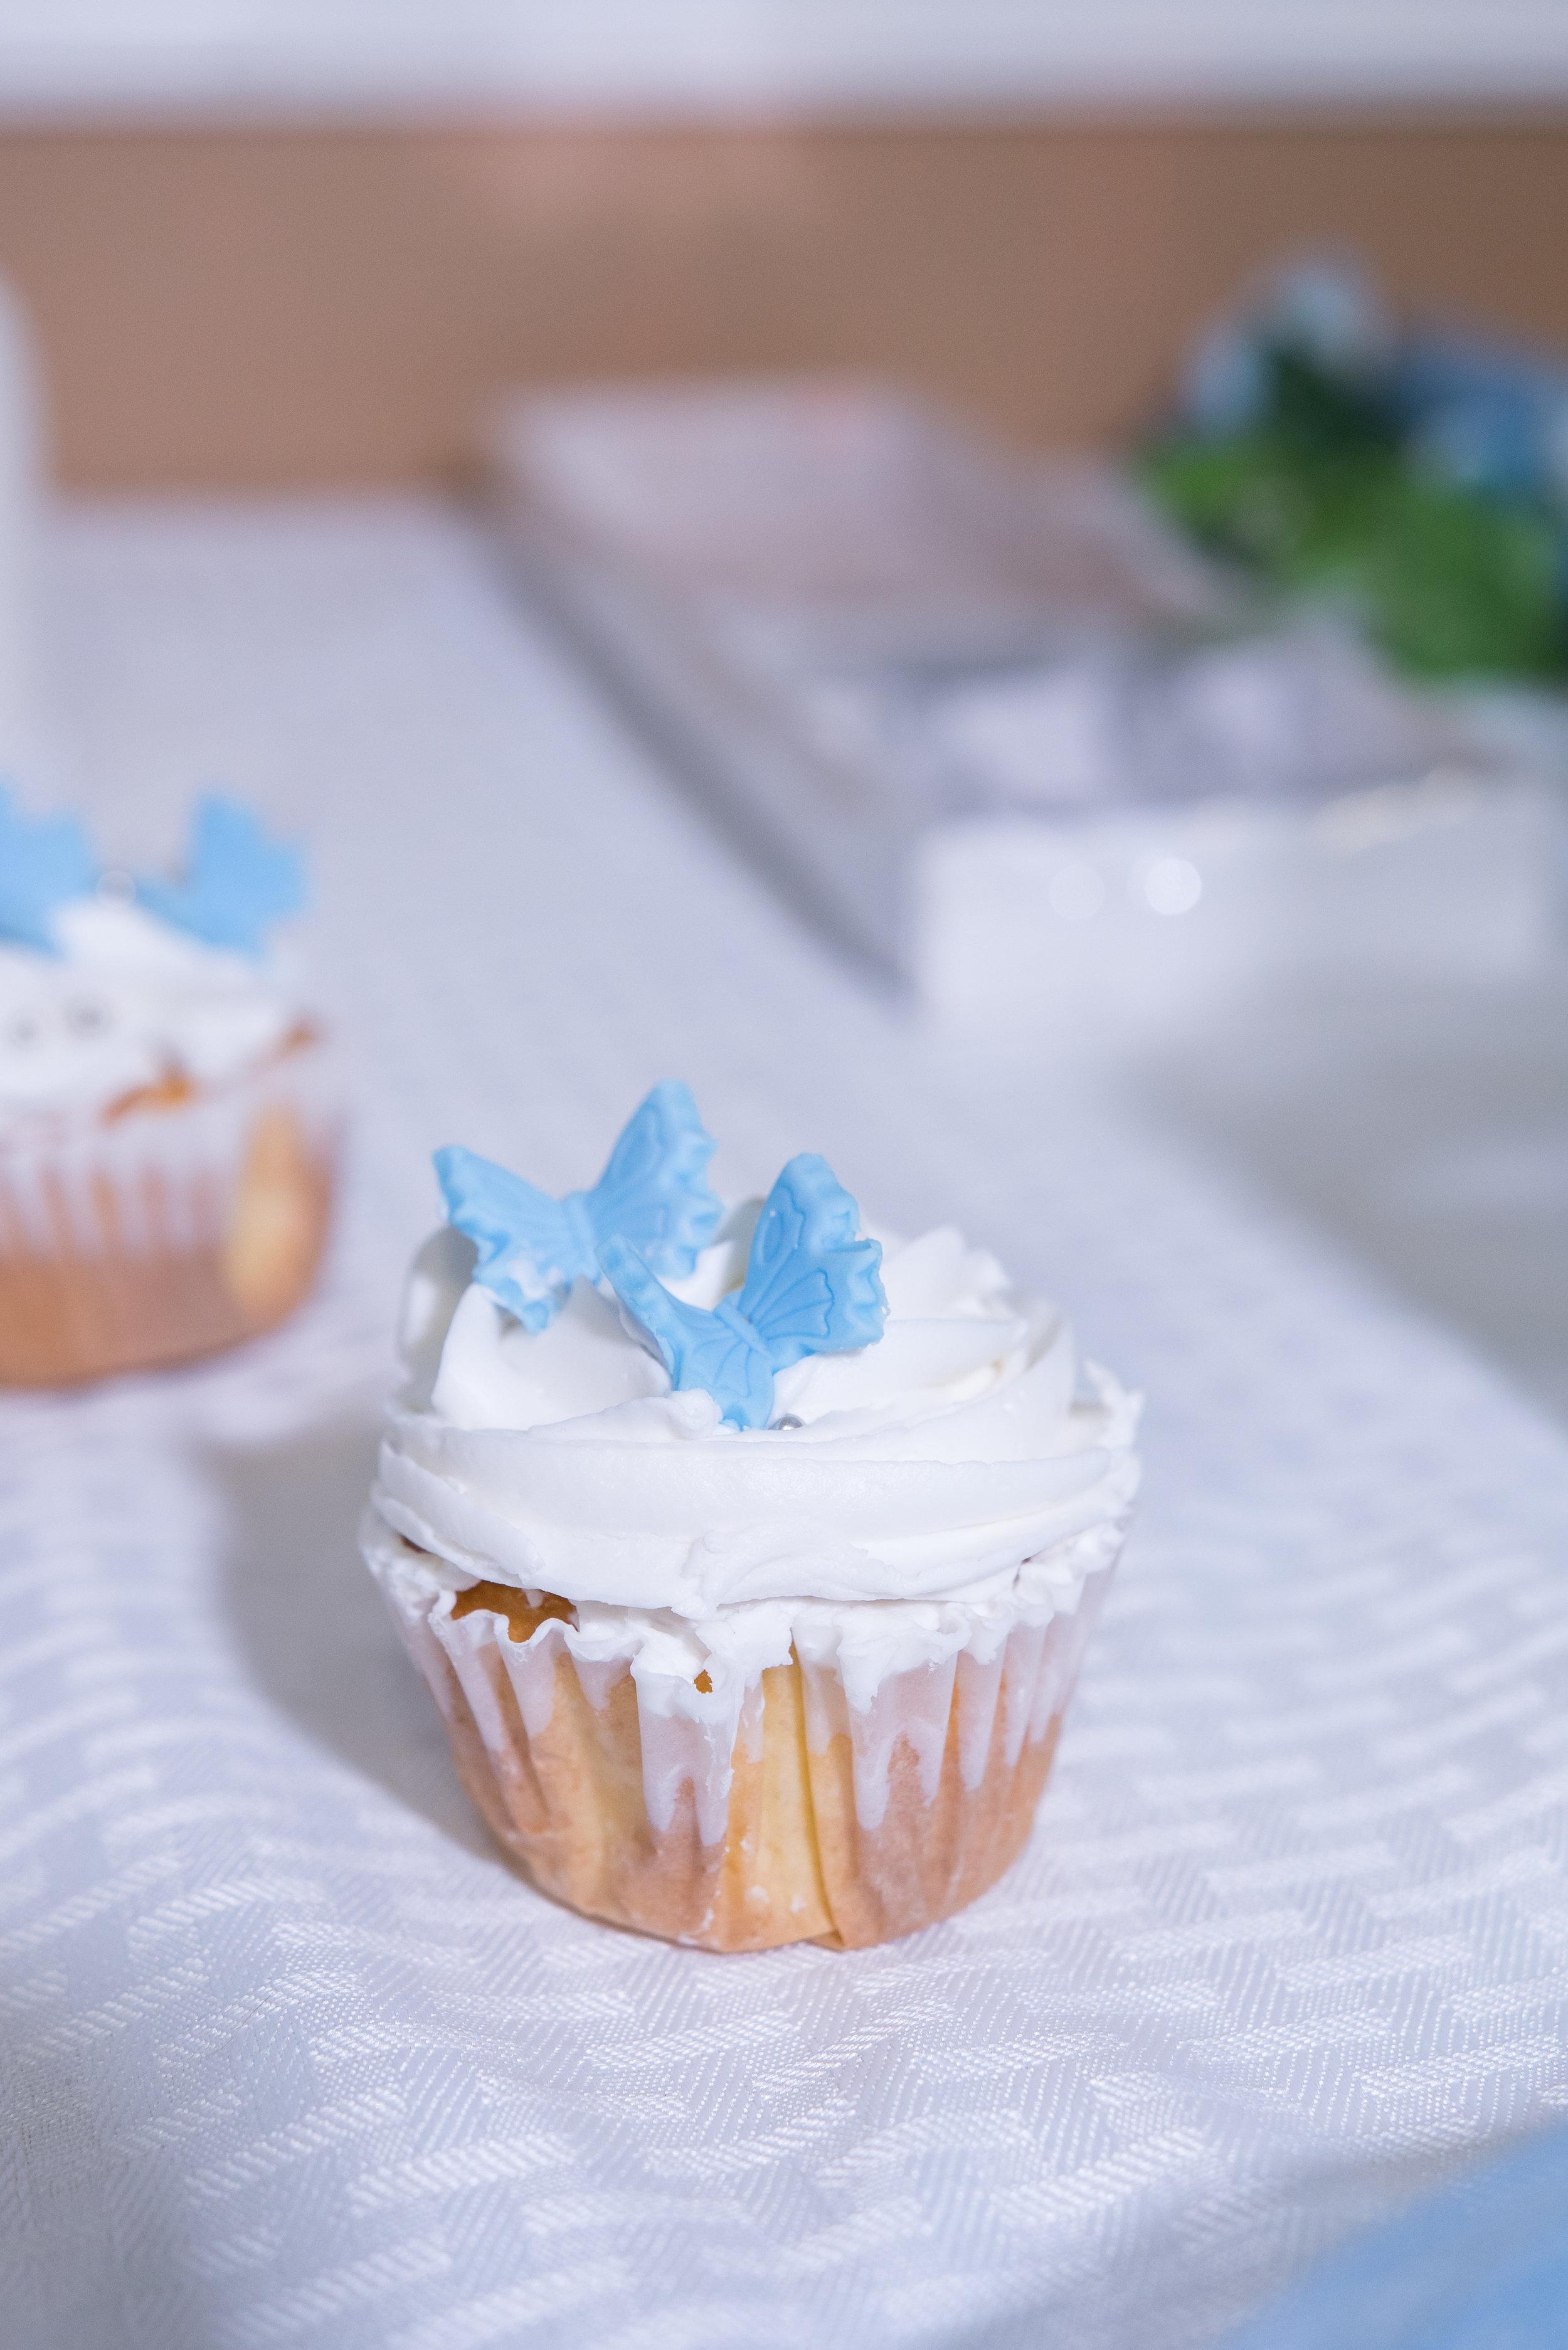 Wesley-Chapel-bakery-cakes, Cupcake-birthday-party